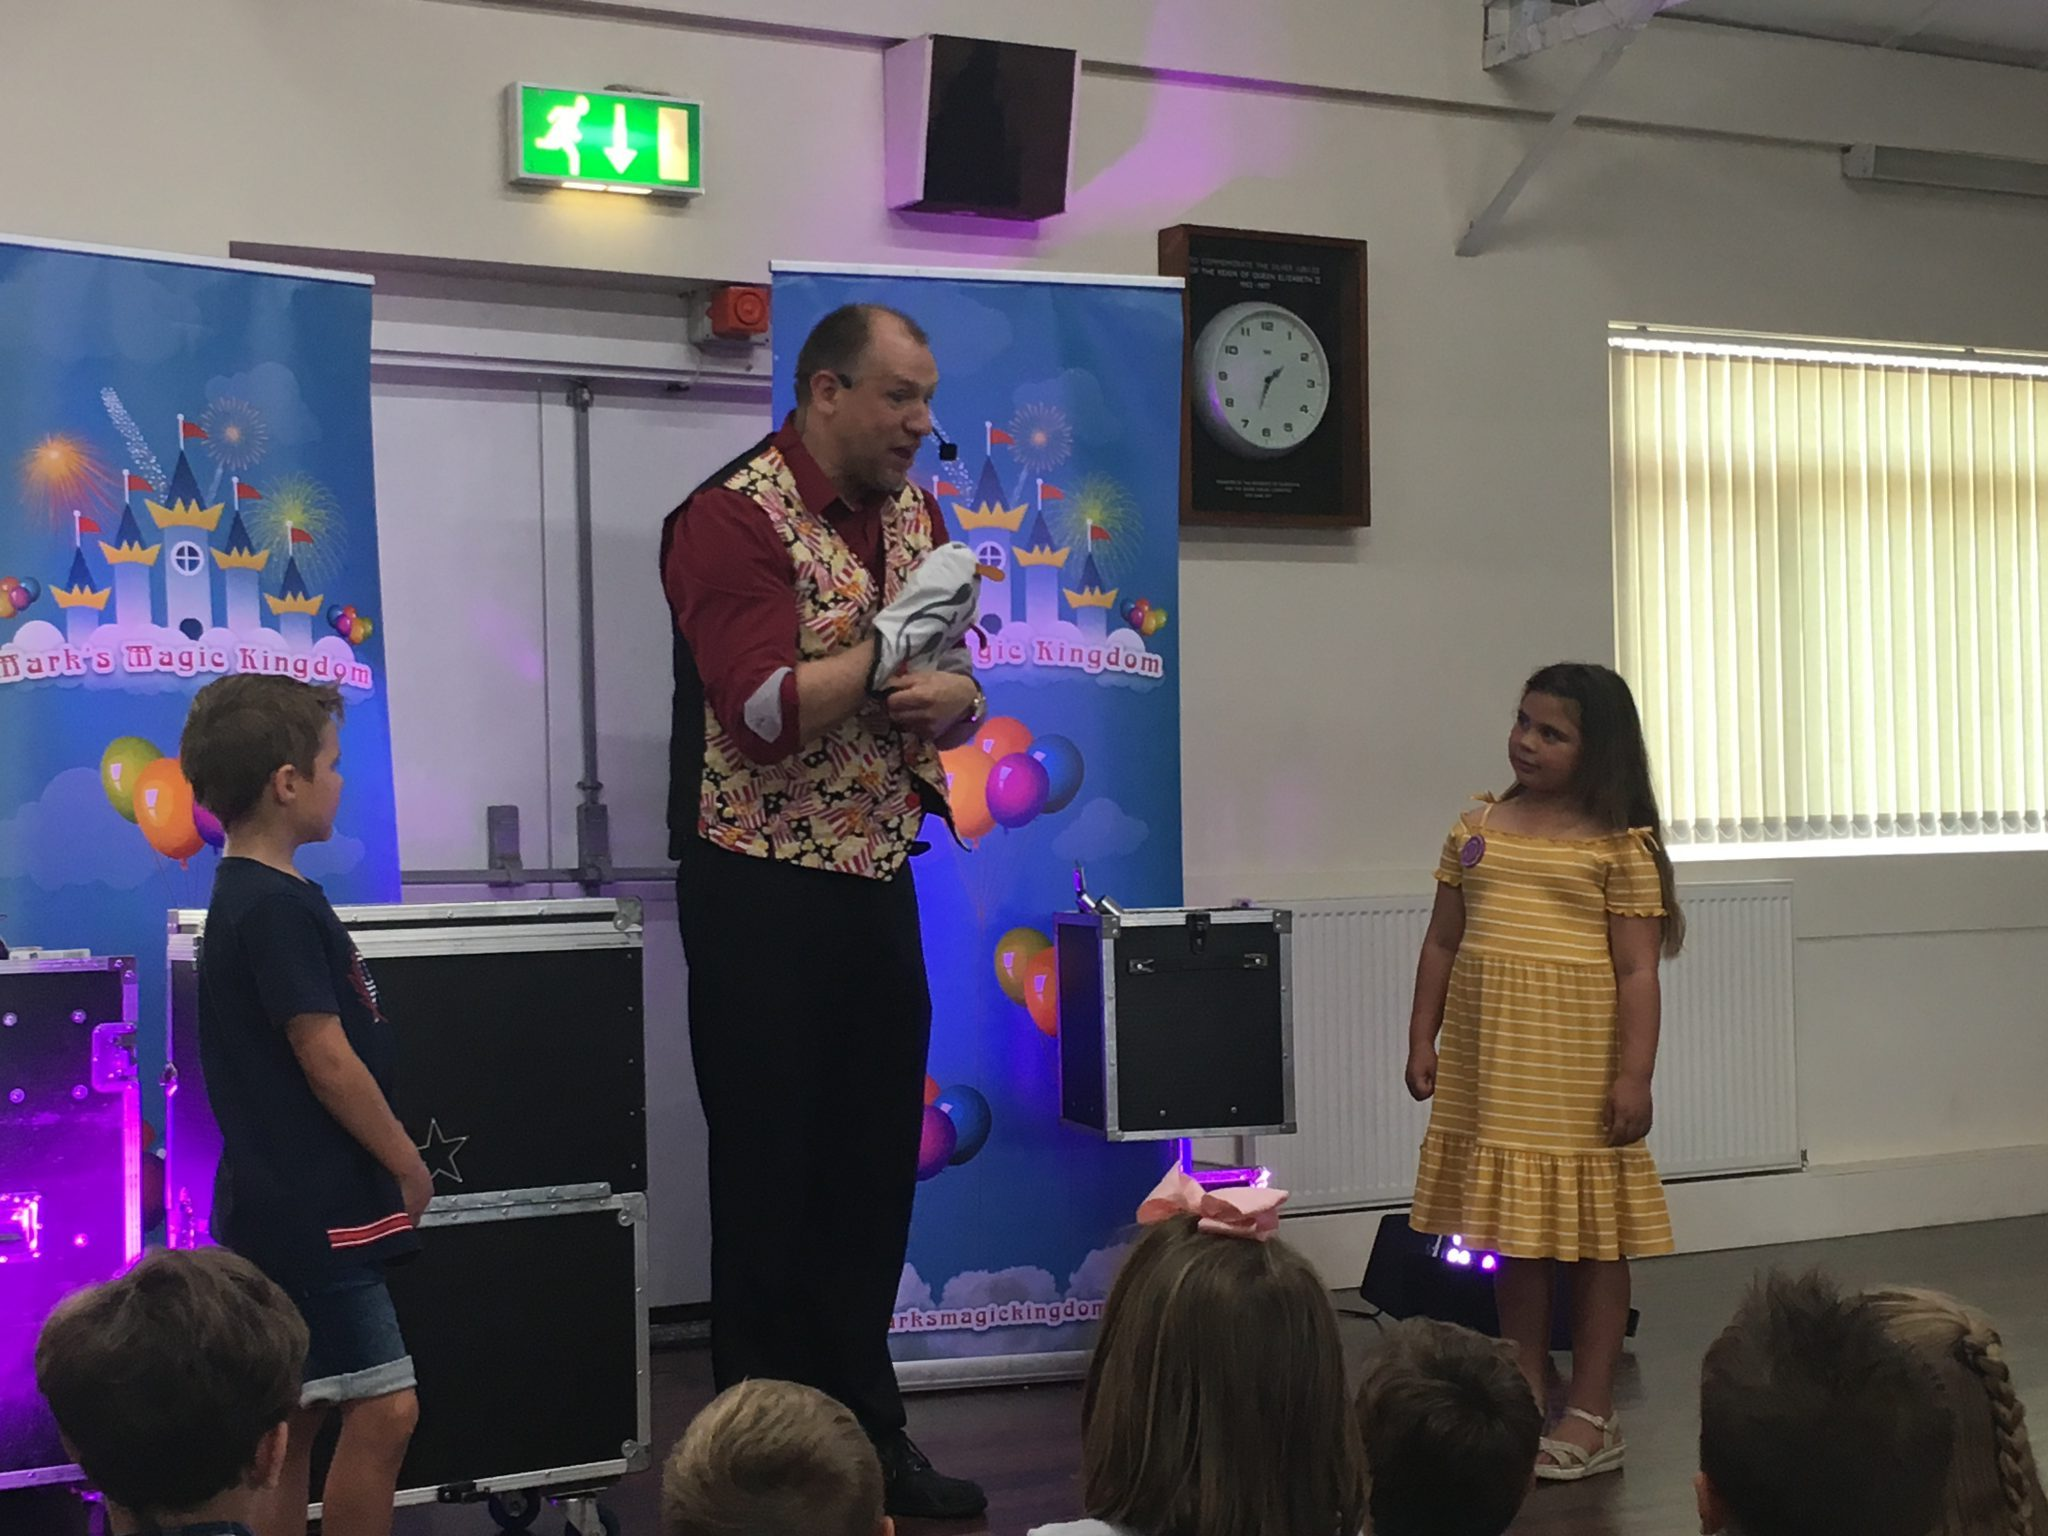 Children's entertainer Magic show